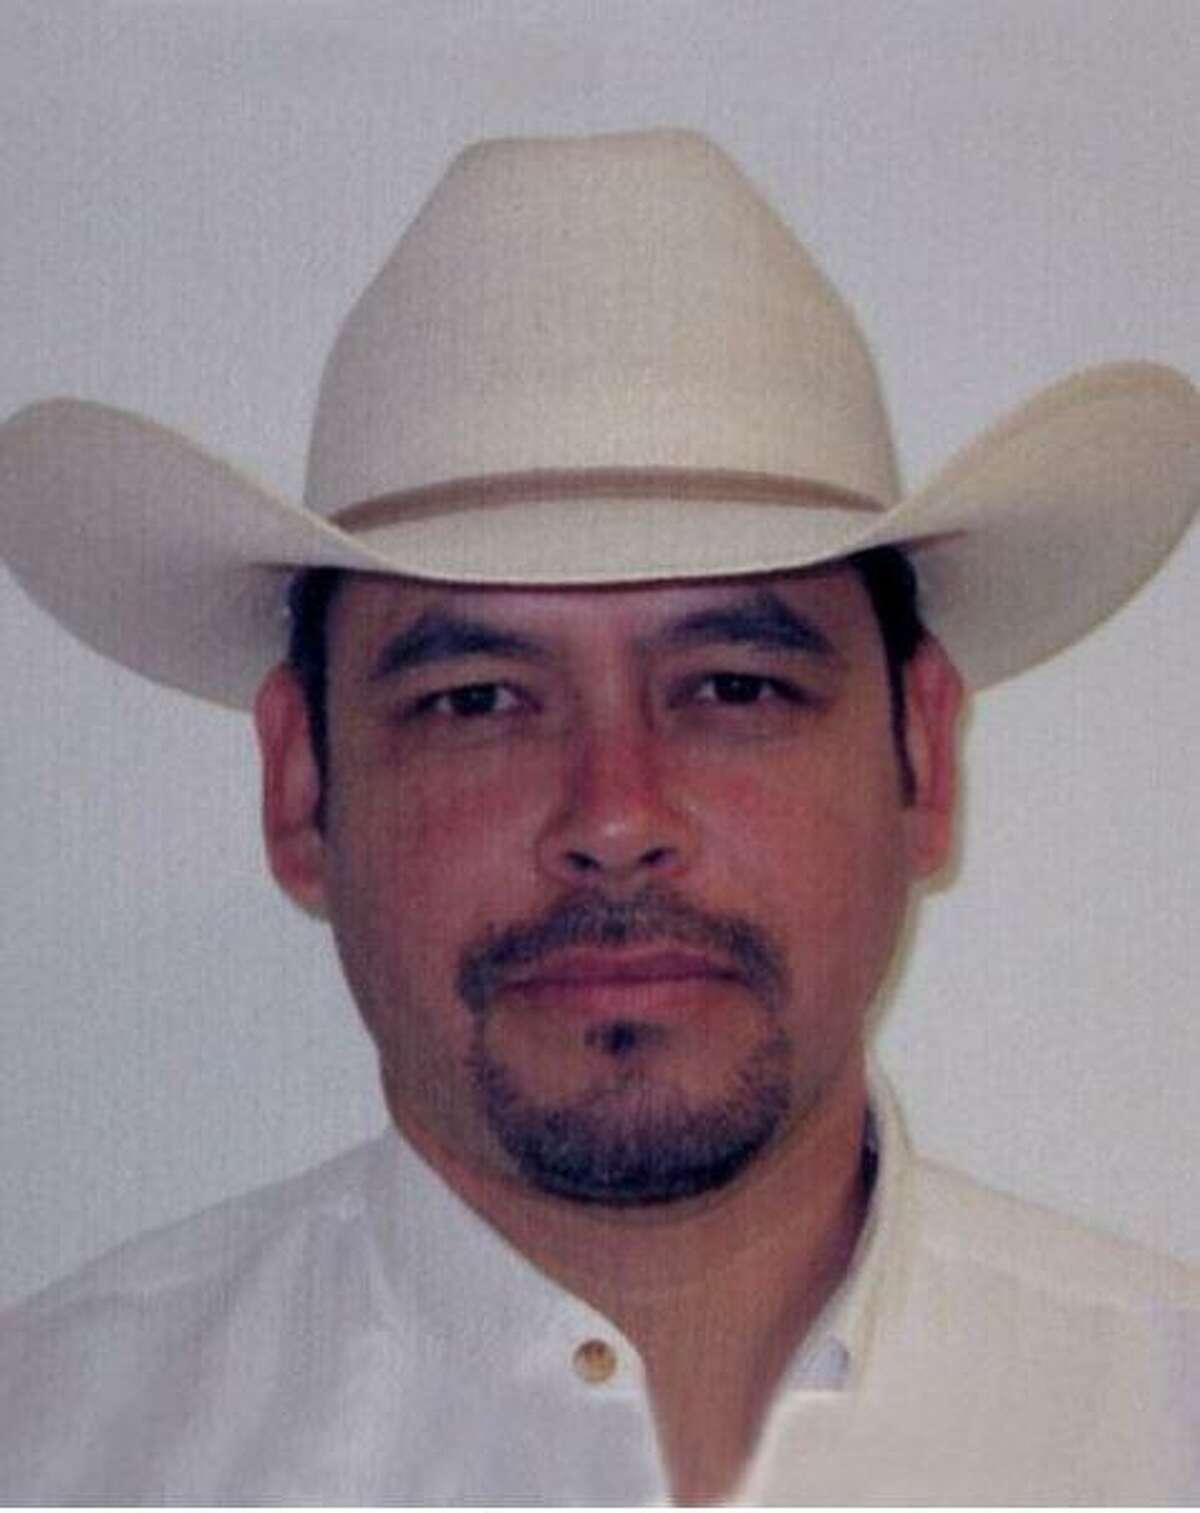 Kimble County Sheriff Hilario Cantu